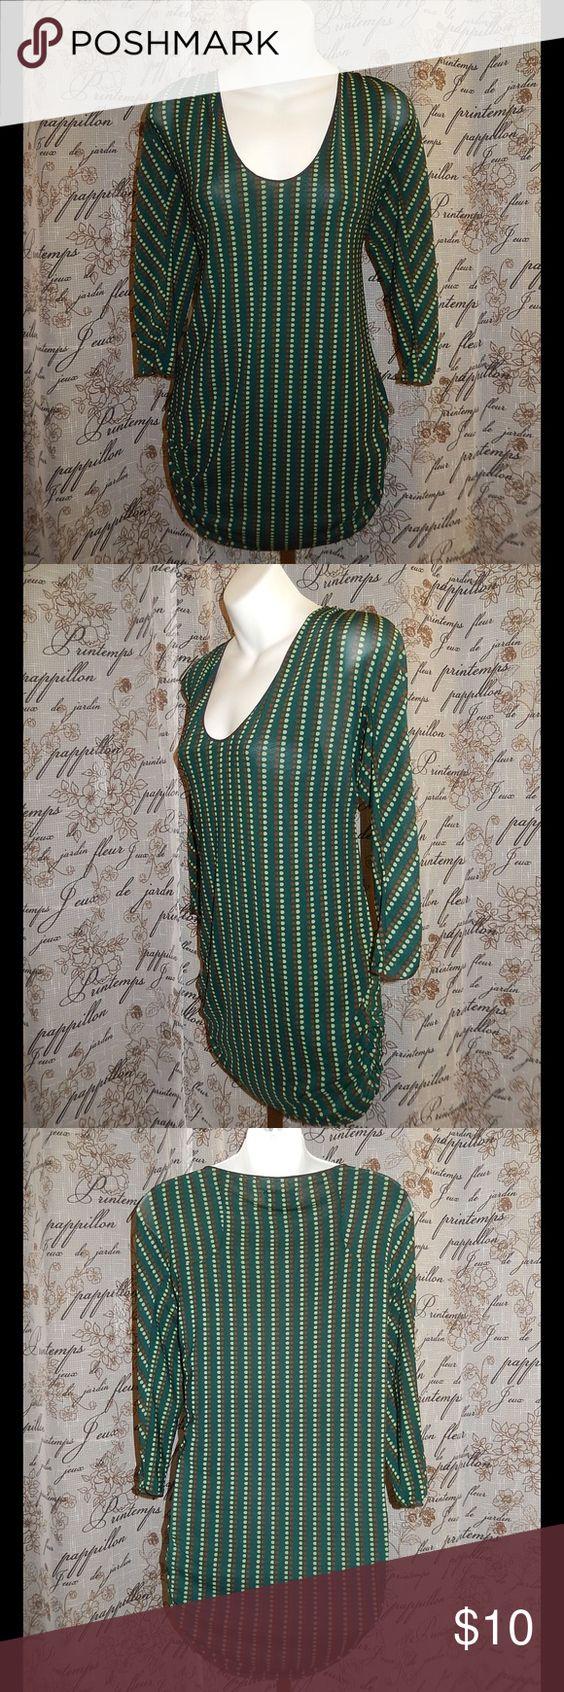 Max Studio Dotted Green Tunic M Max Studio Dotted Green Tunic M MSSP. Shirred sides. 3/4 Sleeves. 95% Nylon, 5% Spandex. Bust 35 1/2. Shoulder to hem 28. Max Studio Tops Tunics